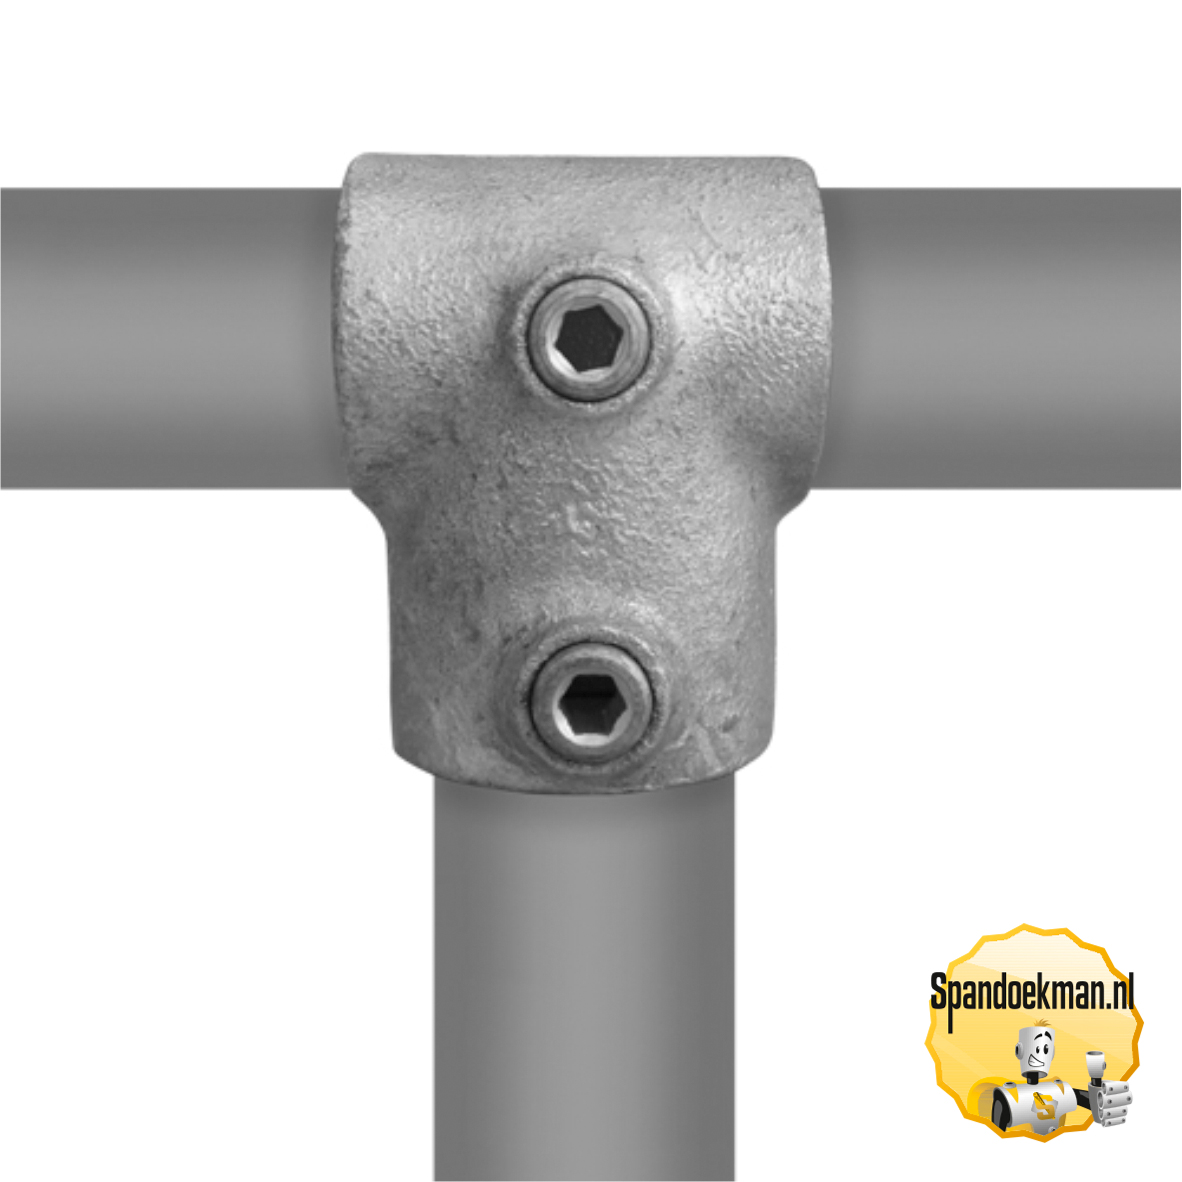 Buiskoppeling T-stuk kort verloop type 2V - 42,4 - 33,7mm